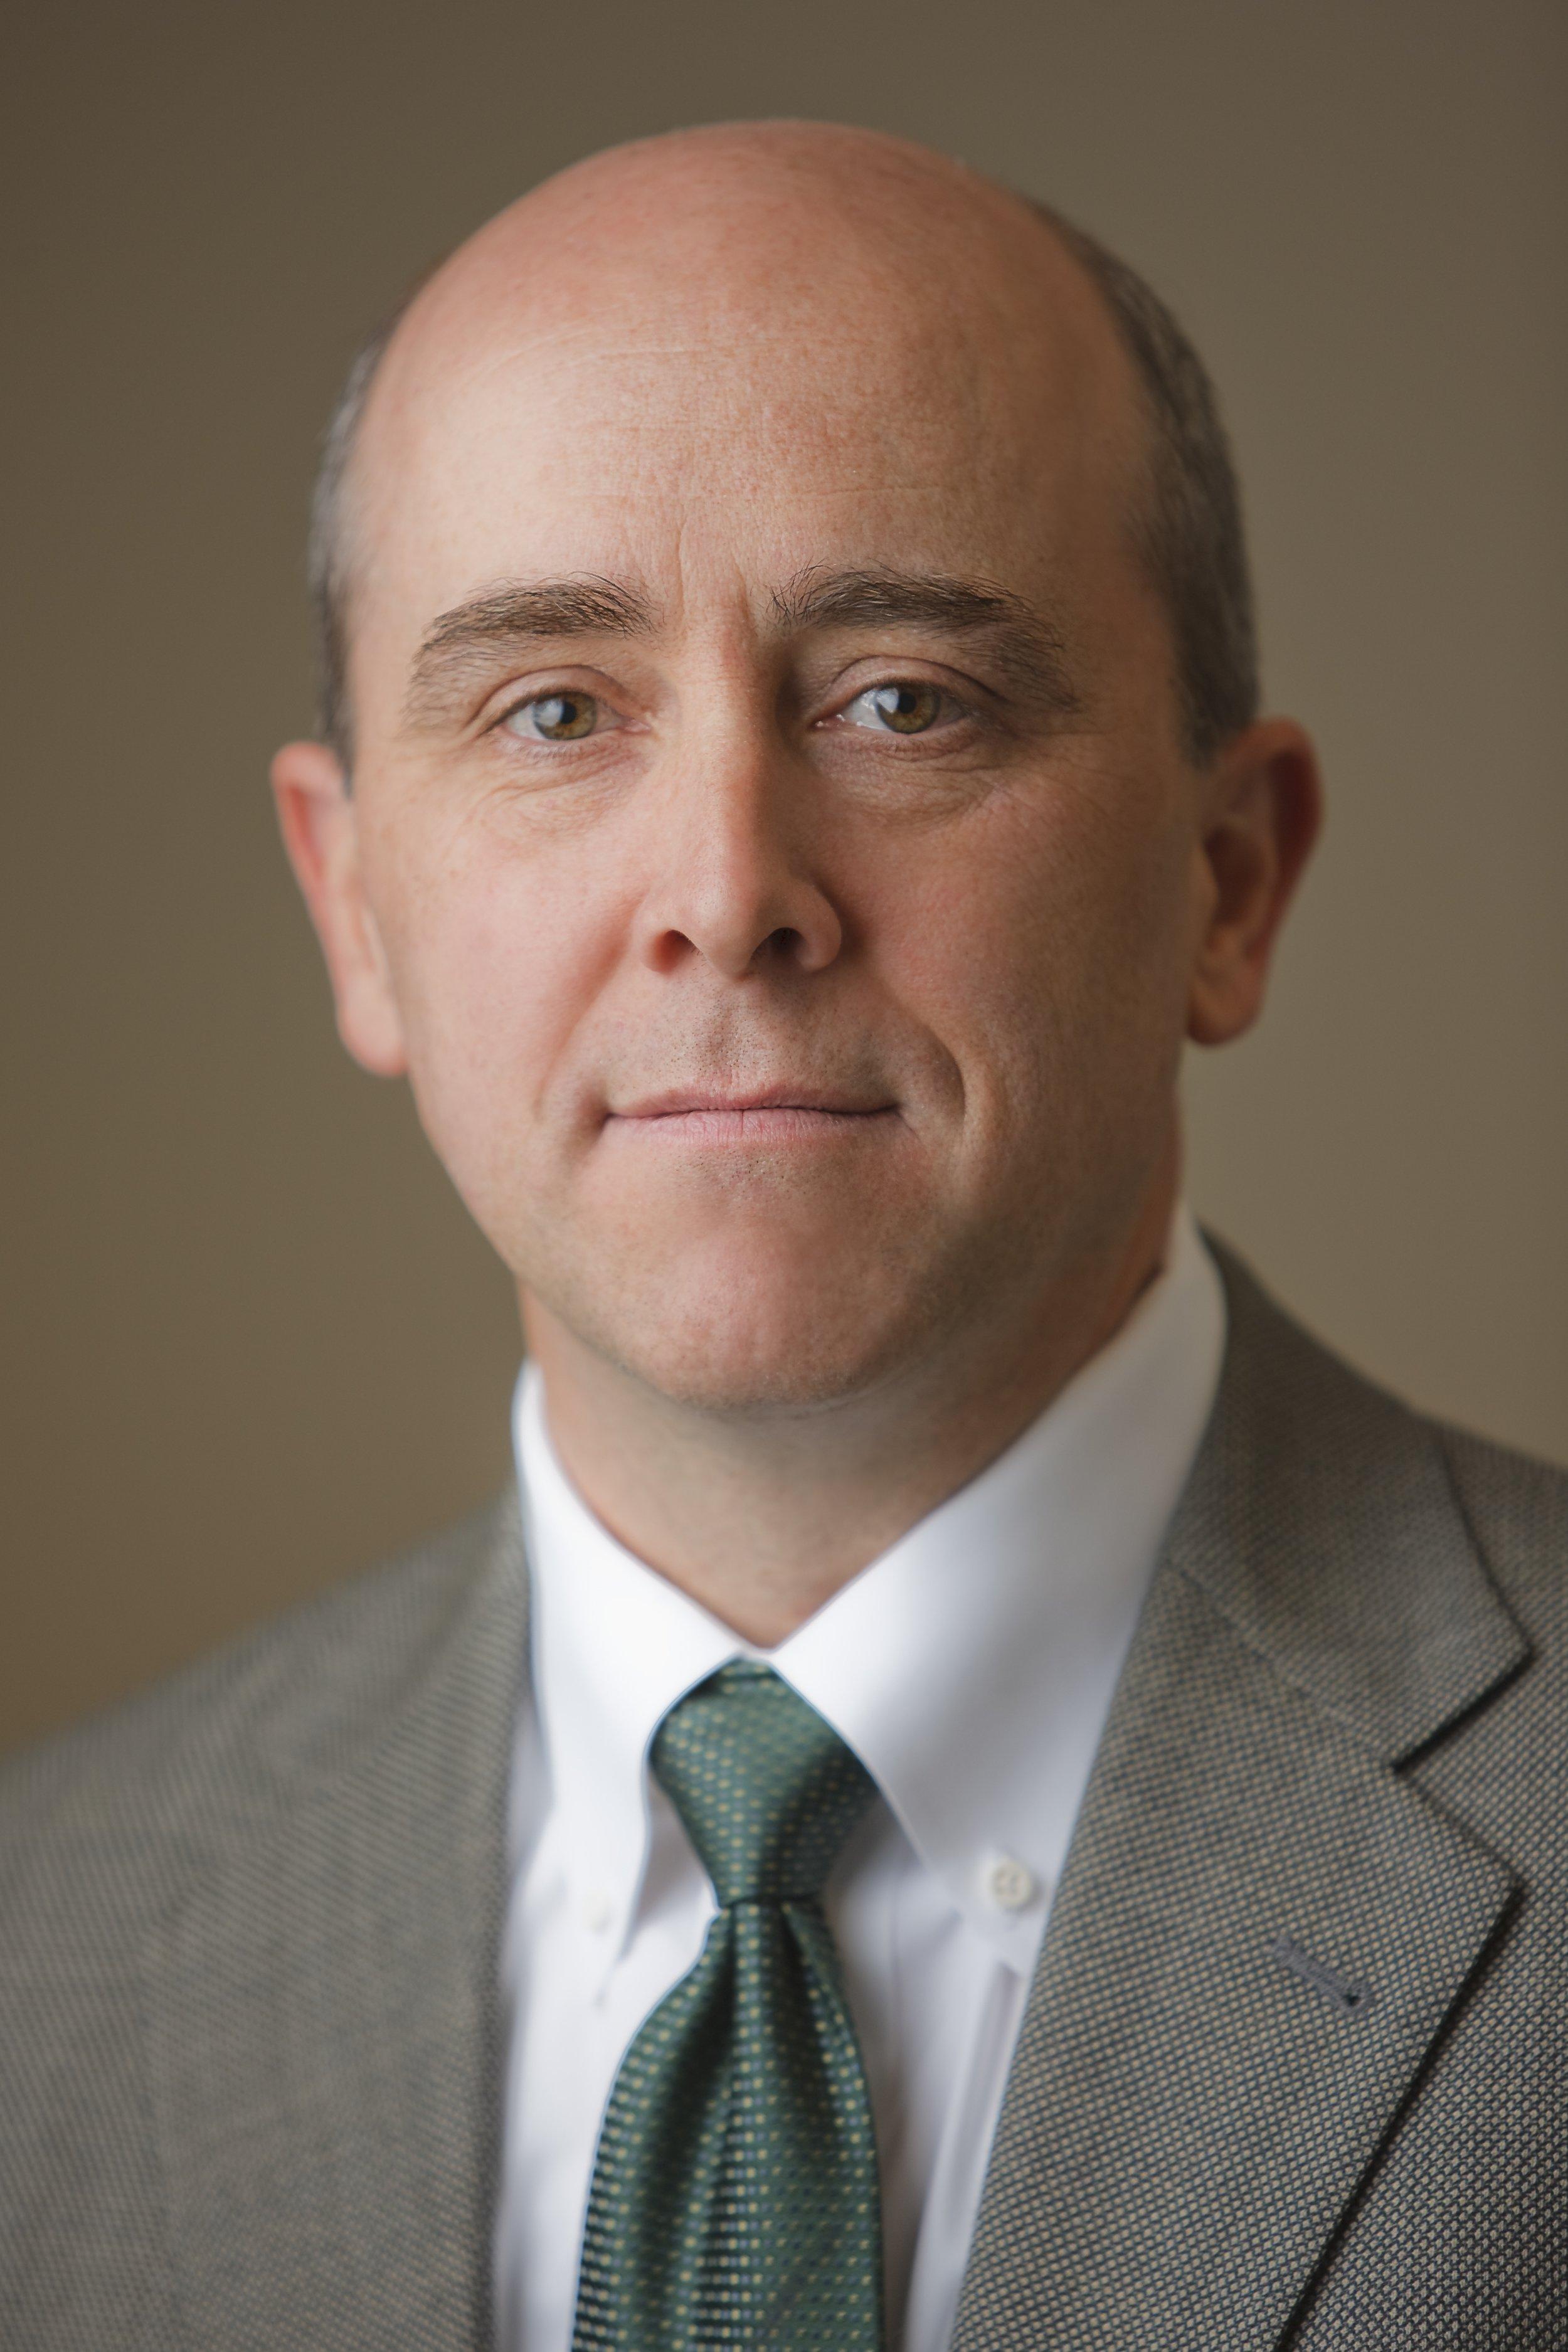 Executive Chairman of the Board